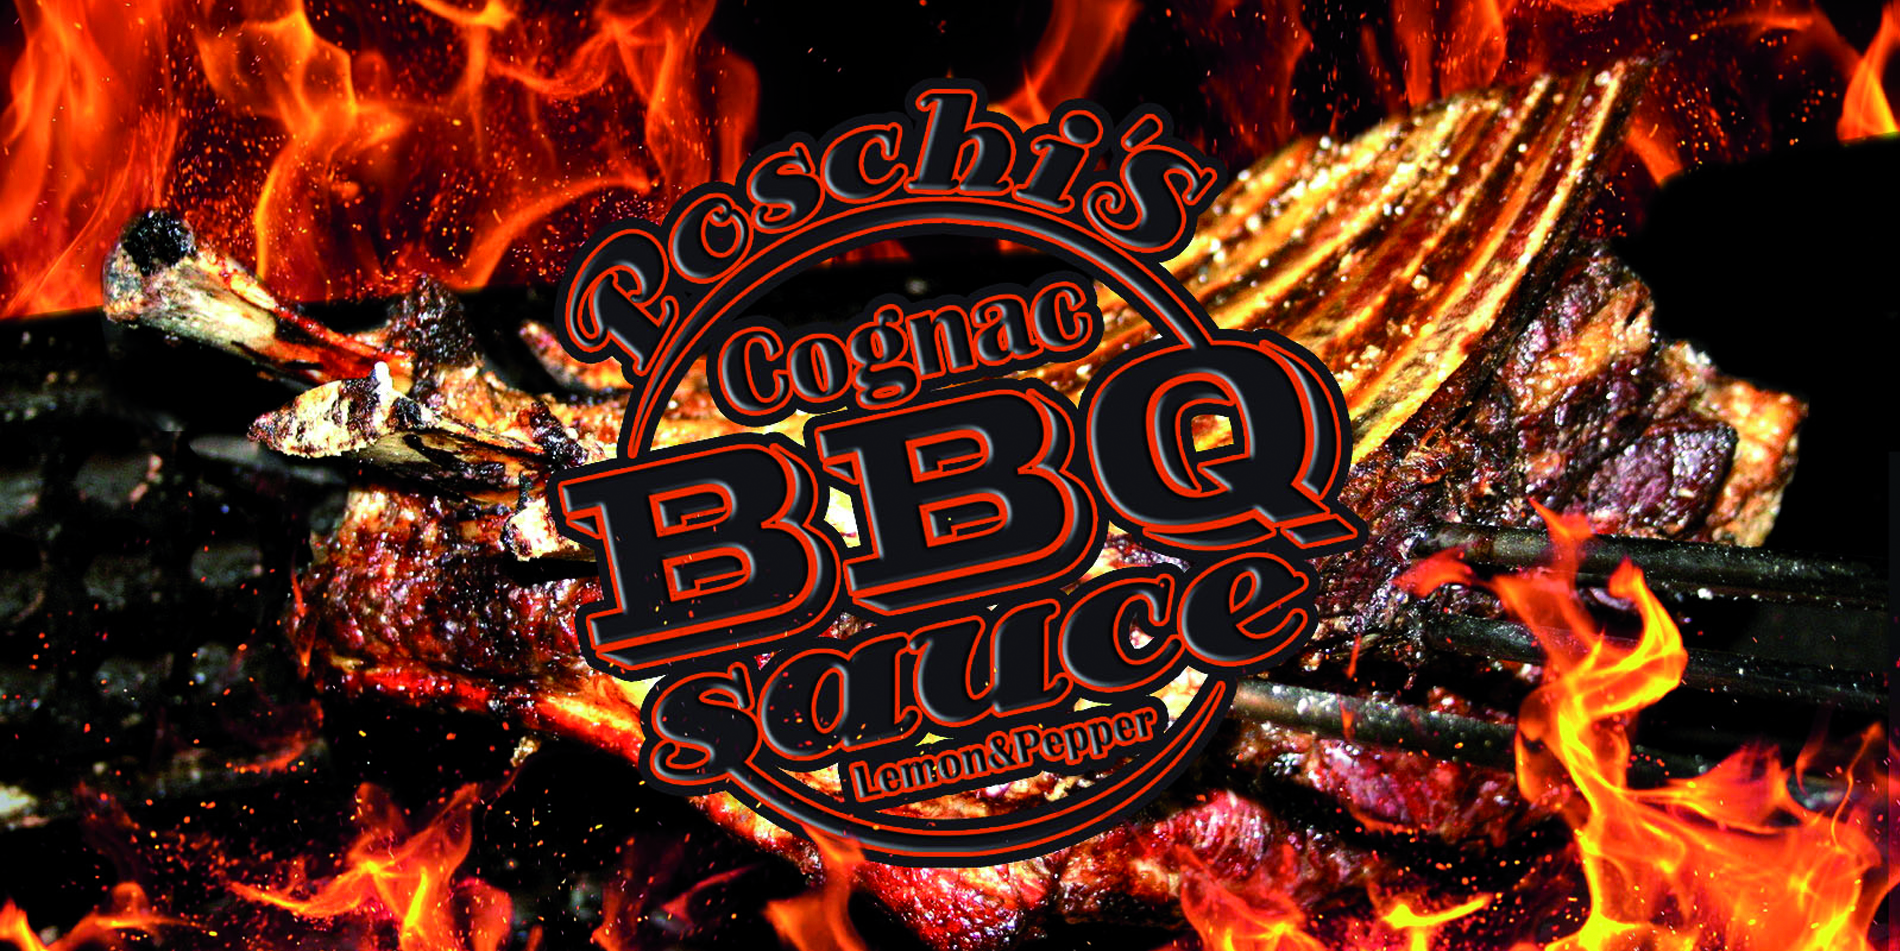 Poschis BBQ sauce